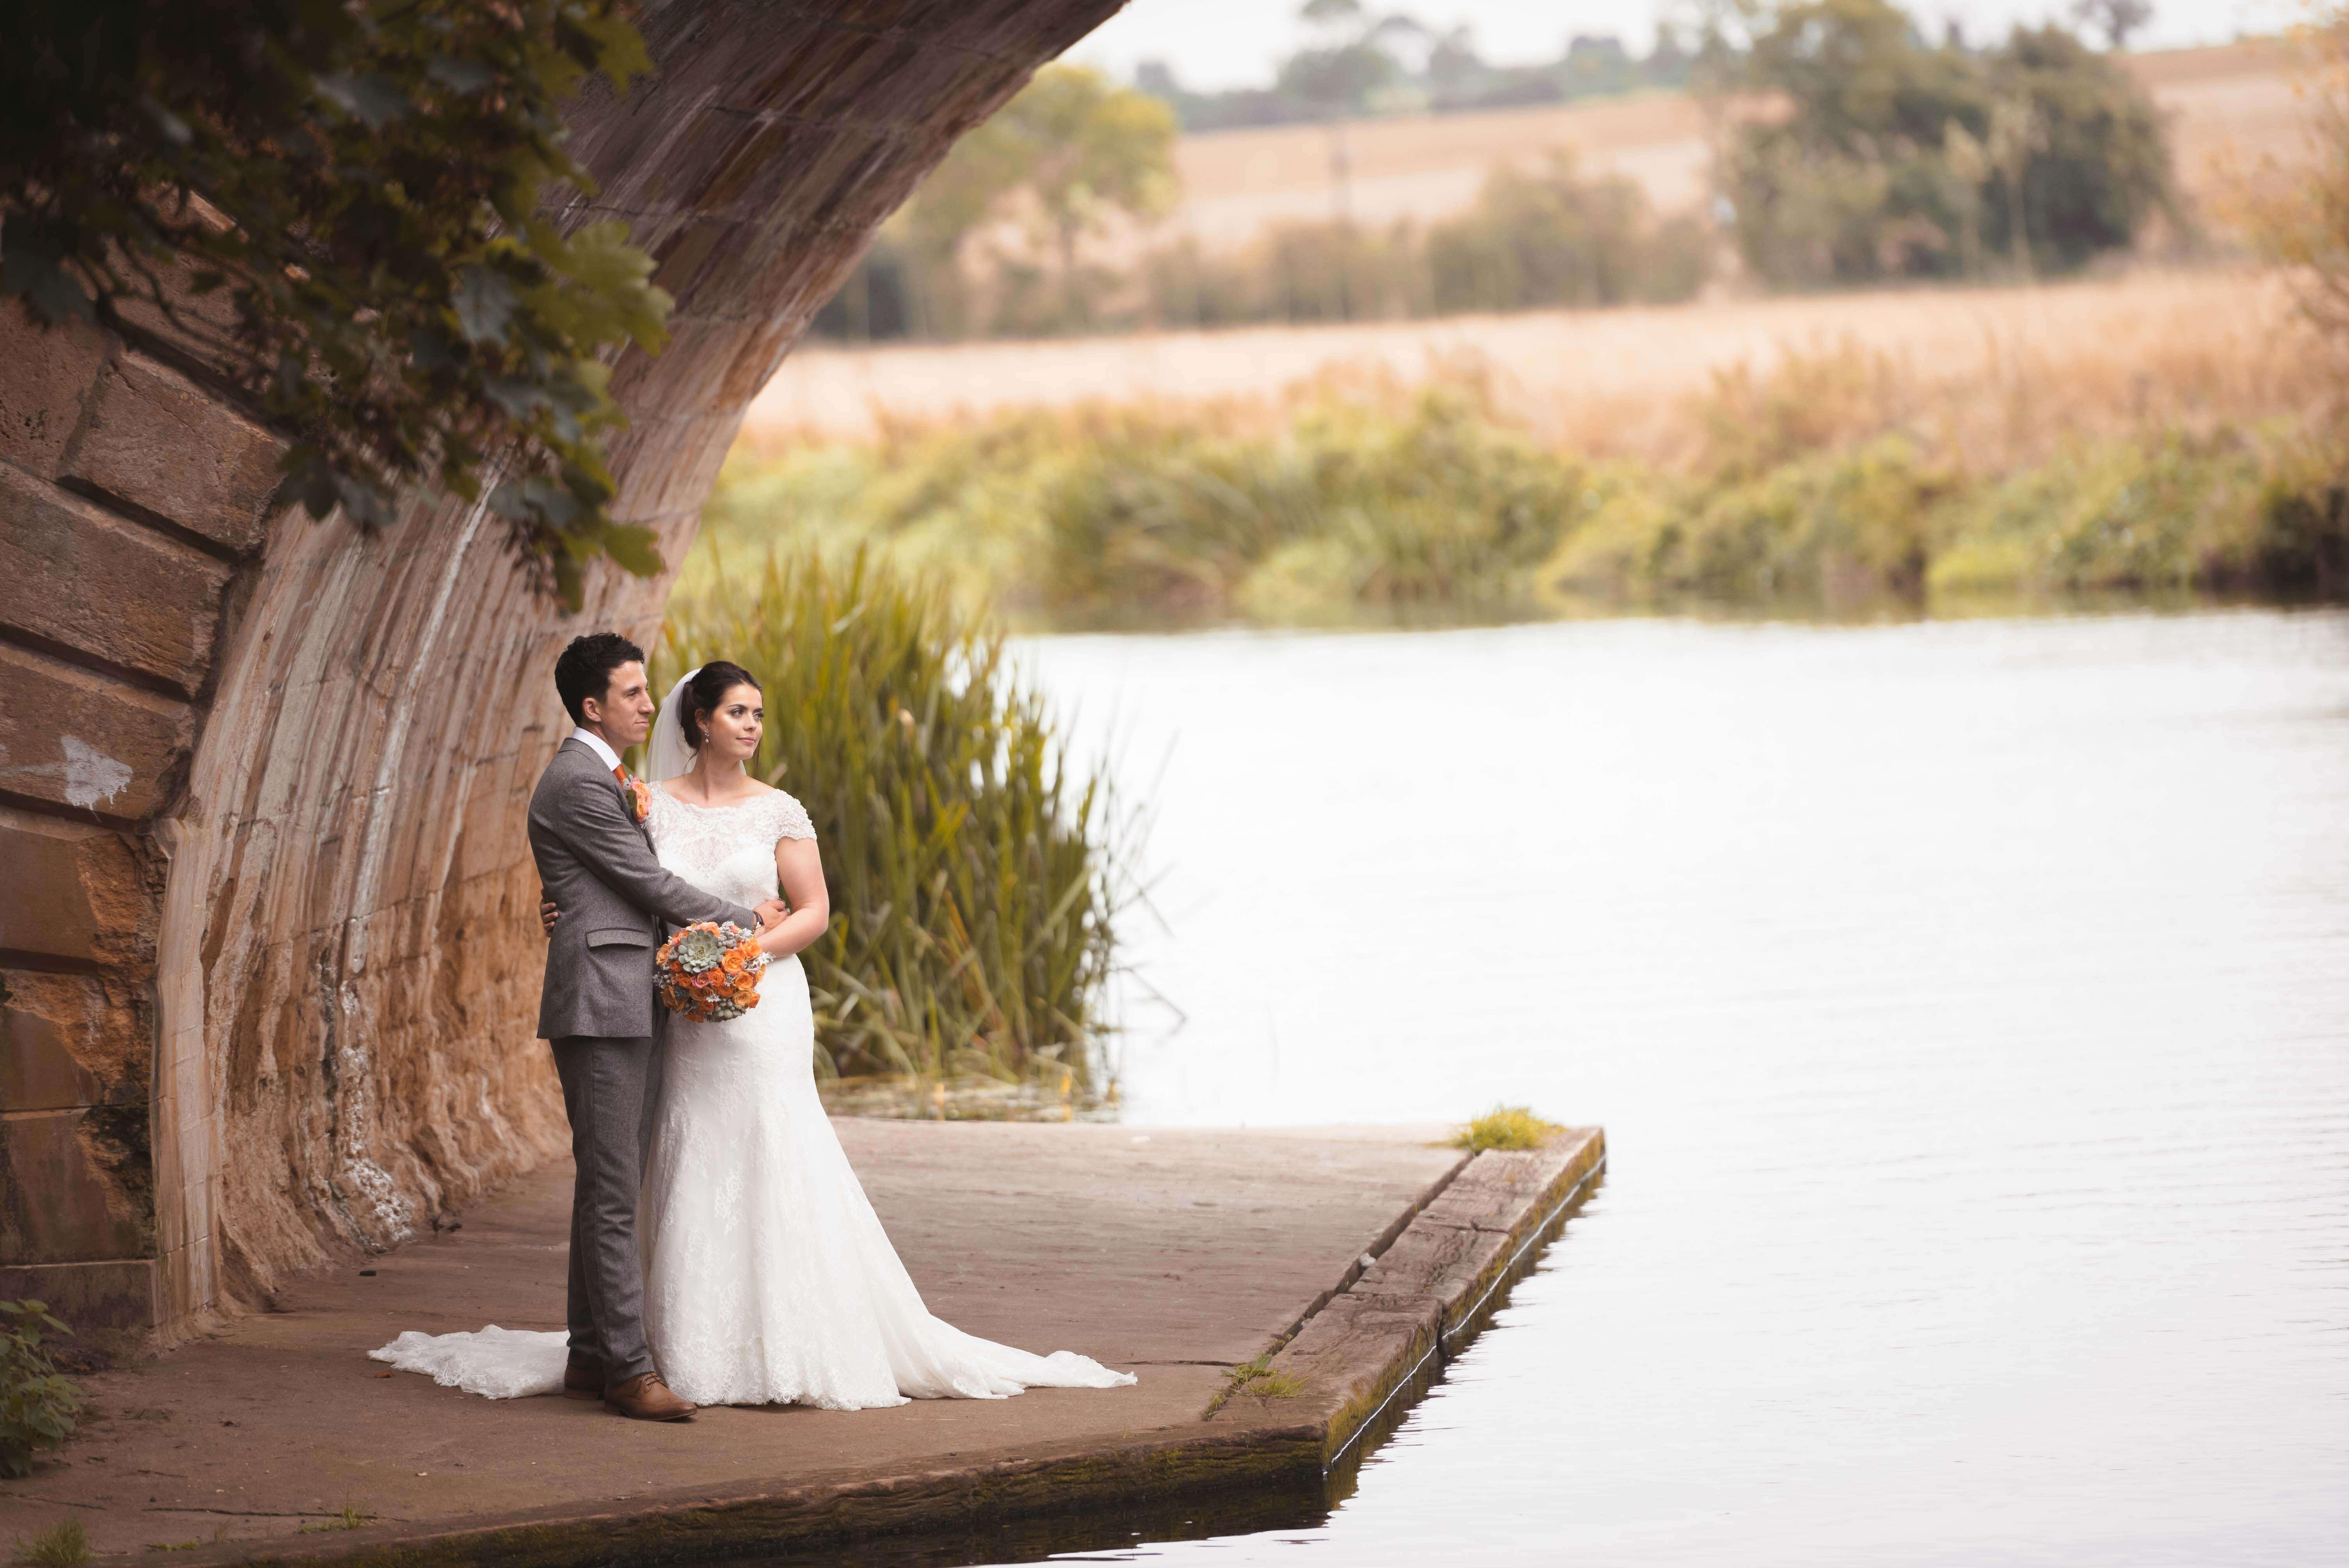 Haycock Hotel Wansford Wedding 18 10 2016 42